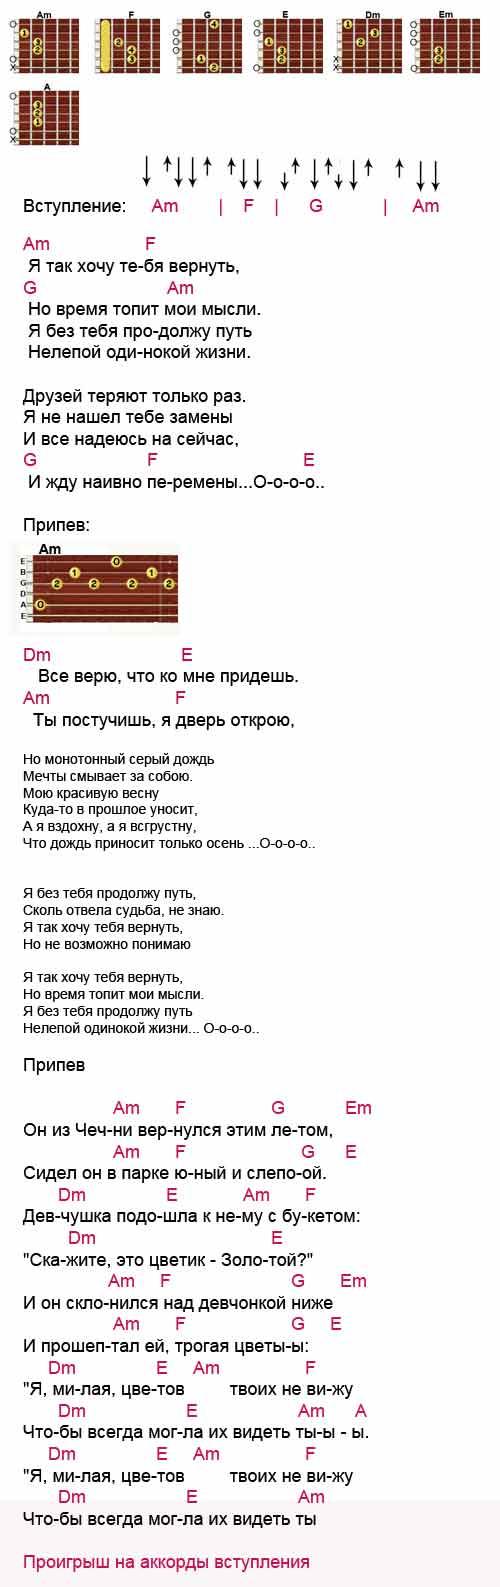 Аккорды к песне «Надежда на сейчас» (Мидан)